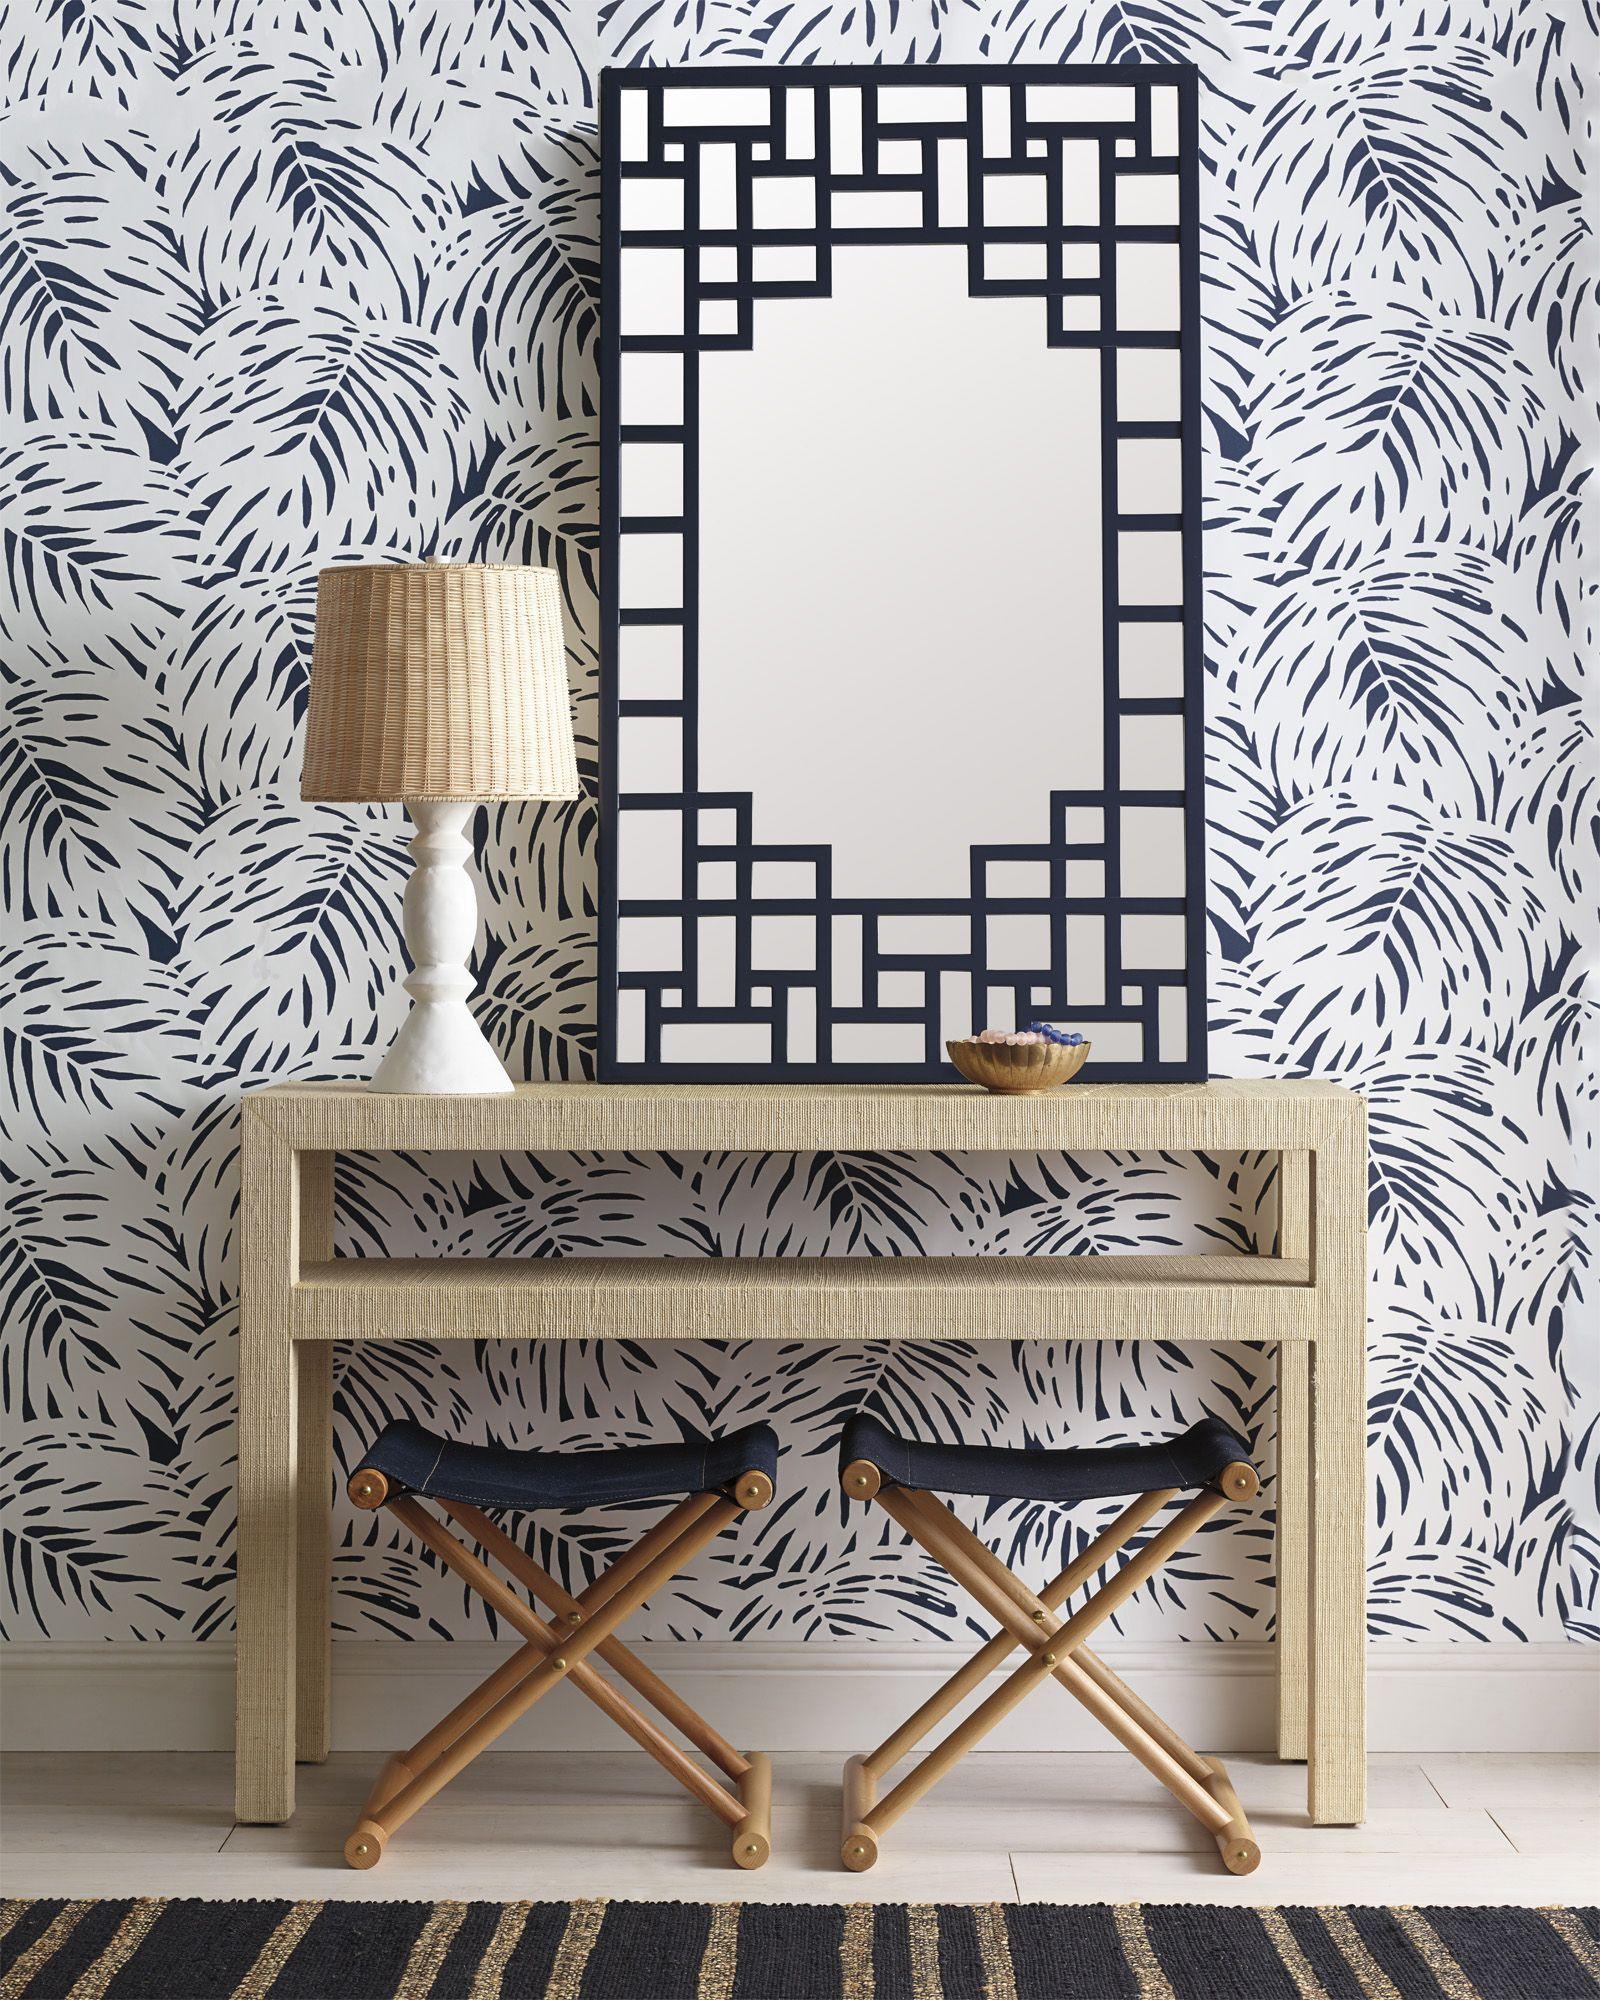 Palm Wallpaper Bathroom Wallpaper Trends Wallpaper Trends Blue And White Wallpaper